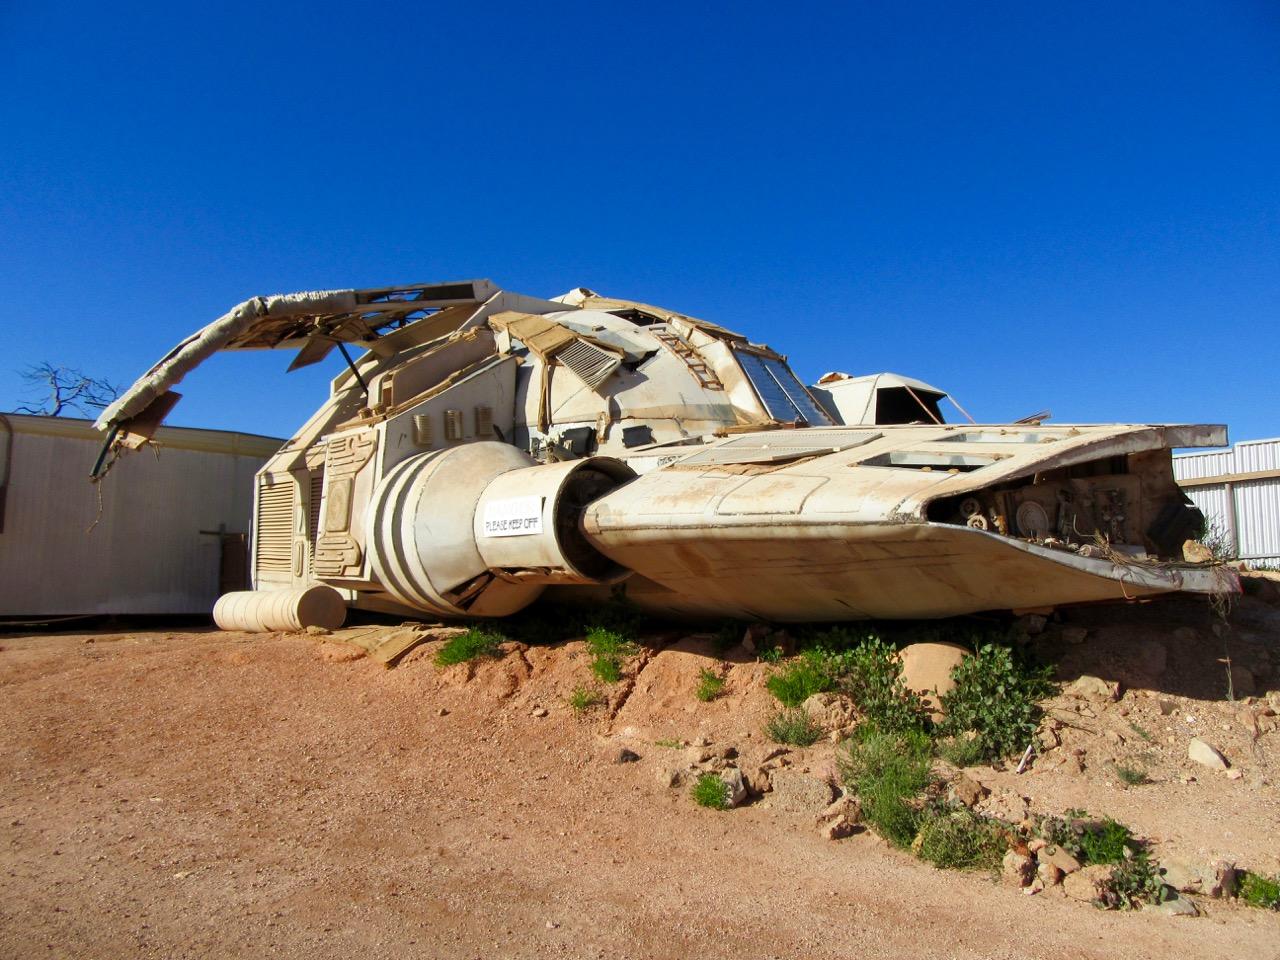 Mad Max Spaceship, Coober Peddy